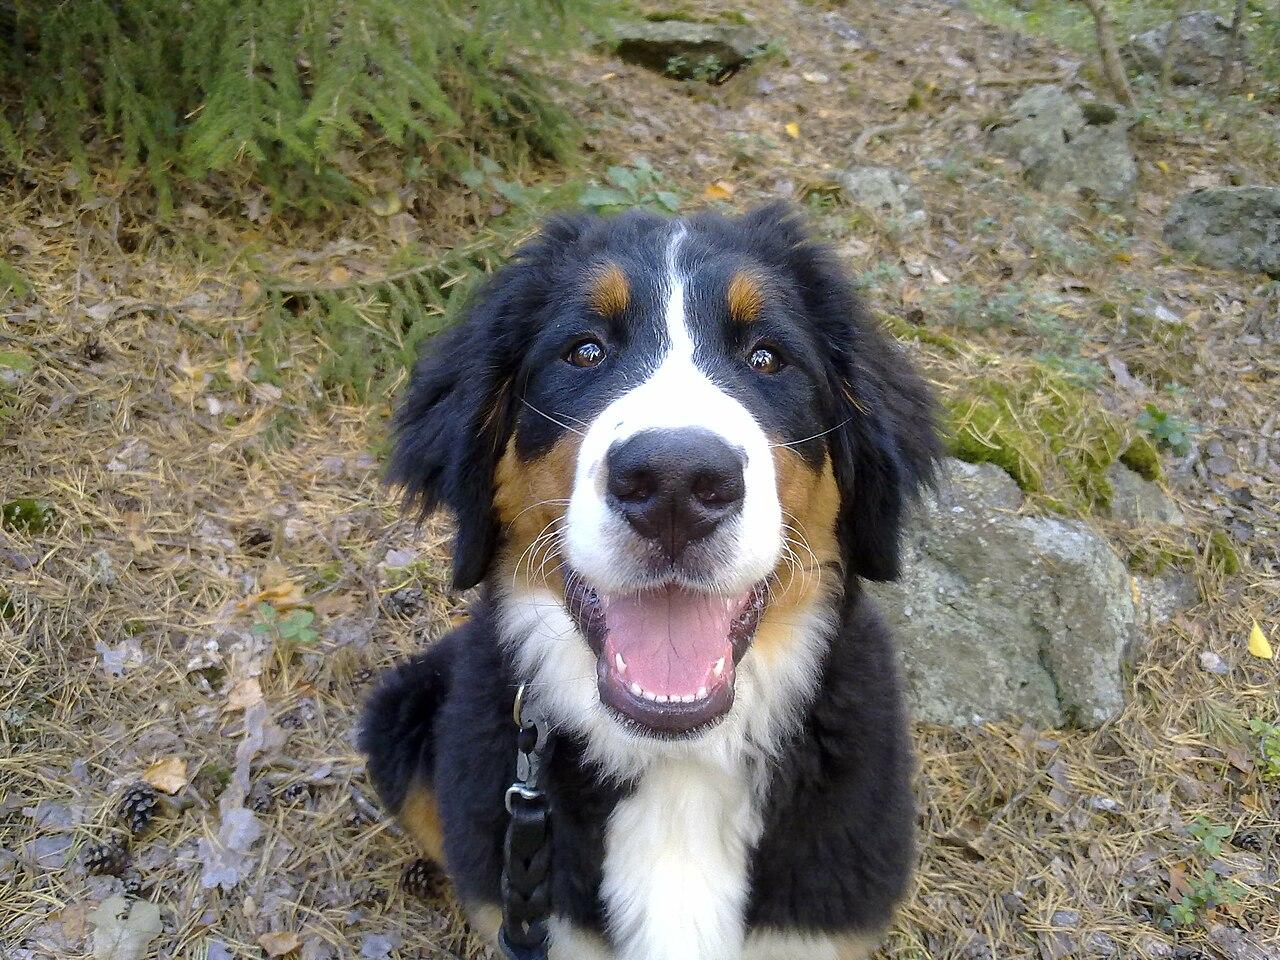 File:Berner Sennen dog Nutella.jpg - Wikimedia Commons Berner Sennen Pups